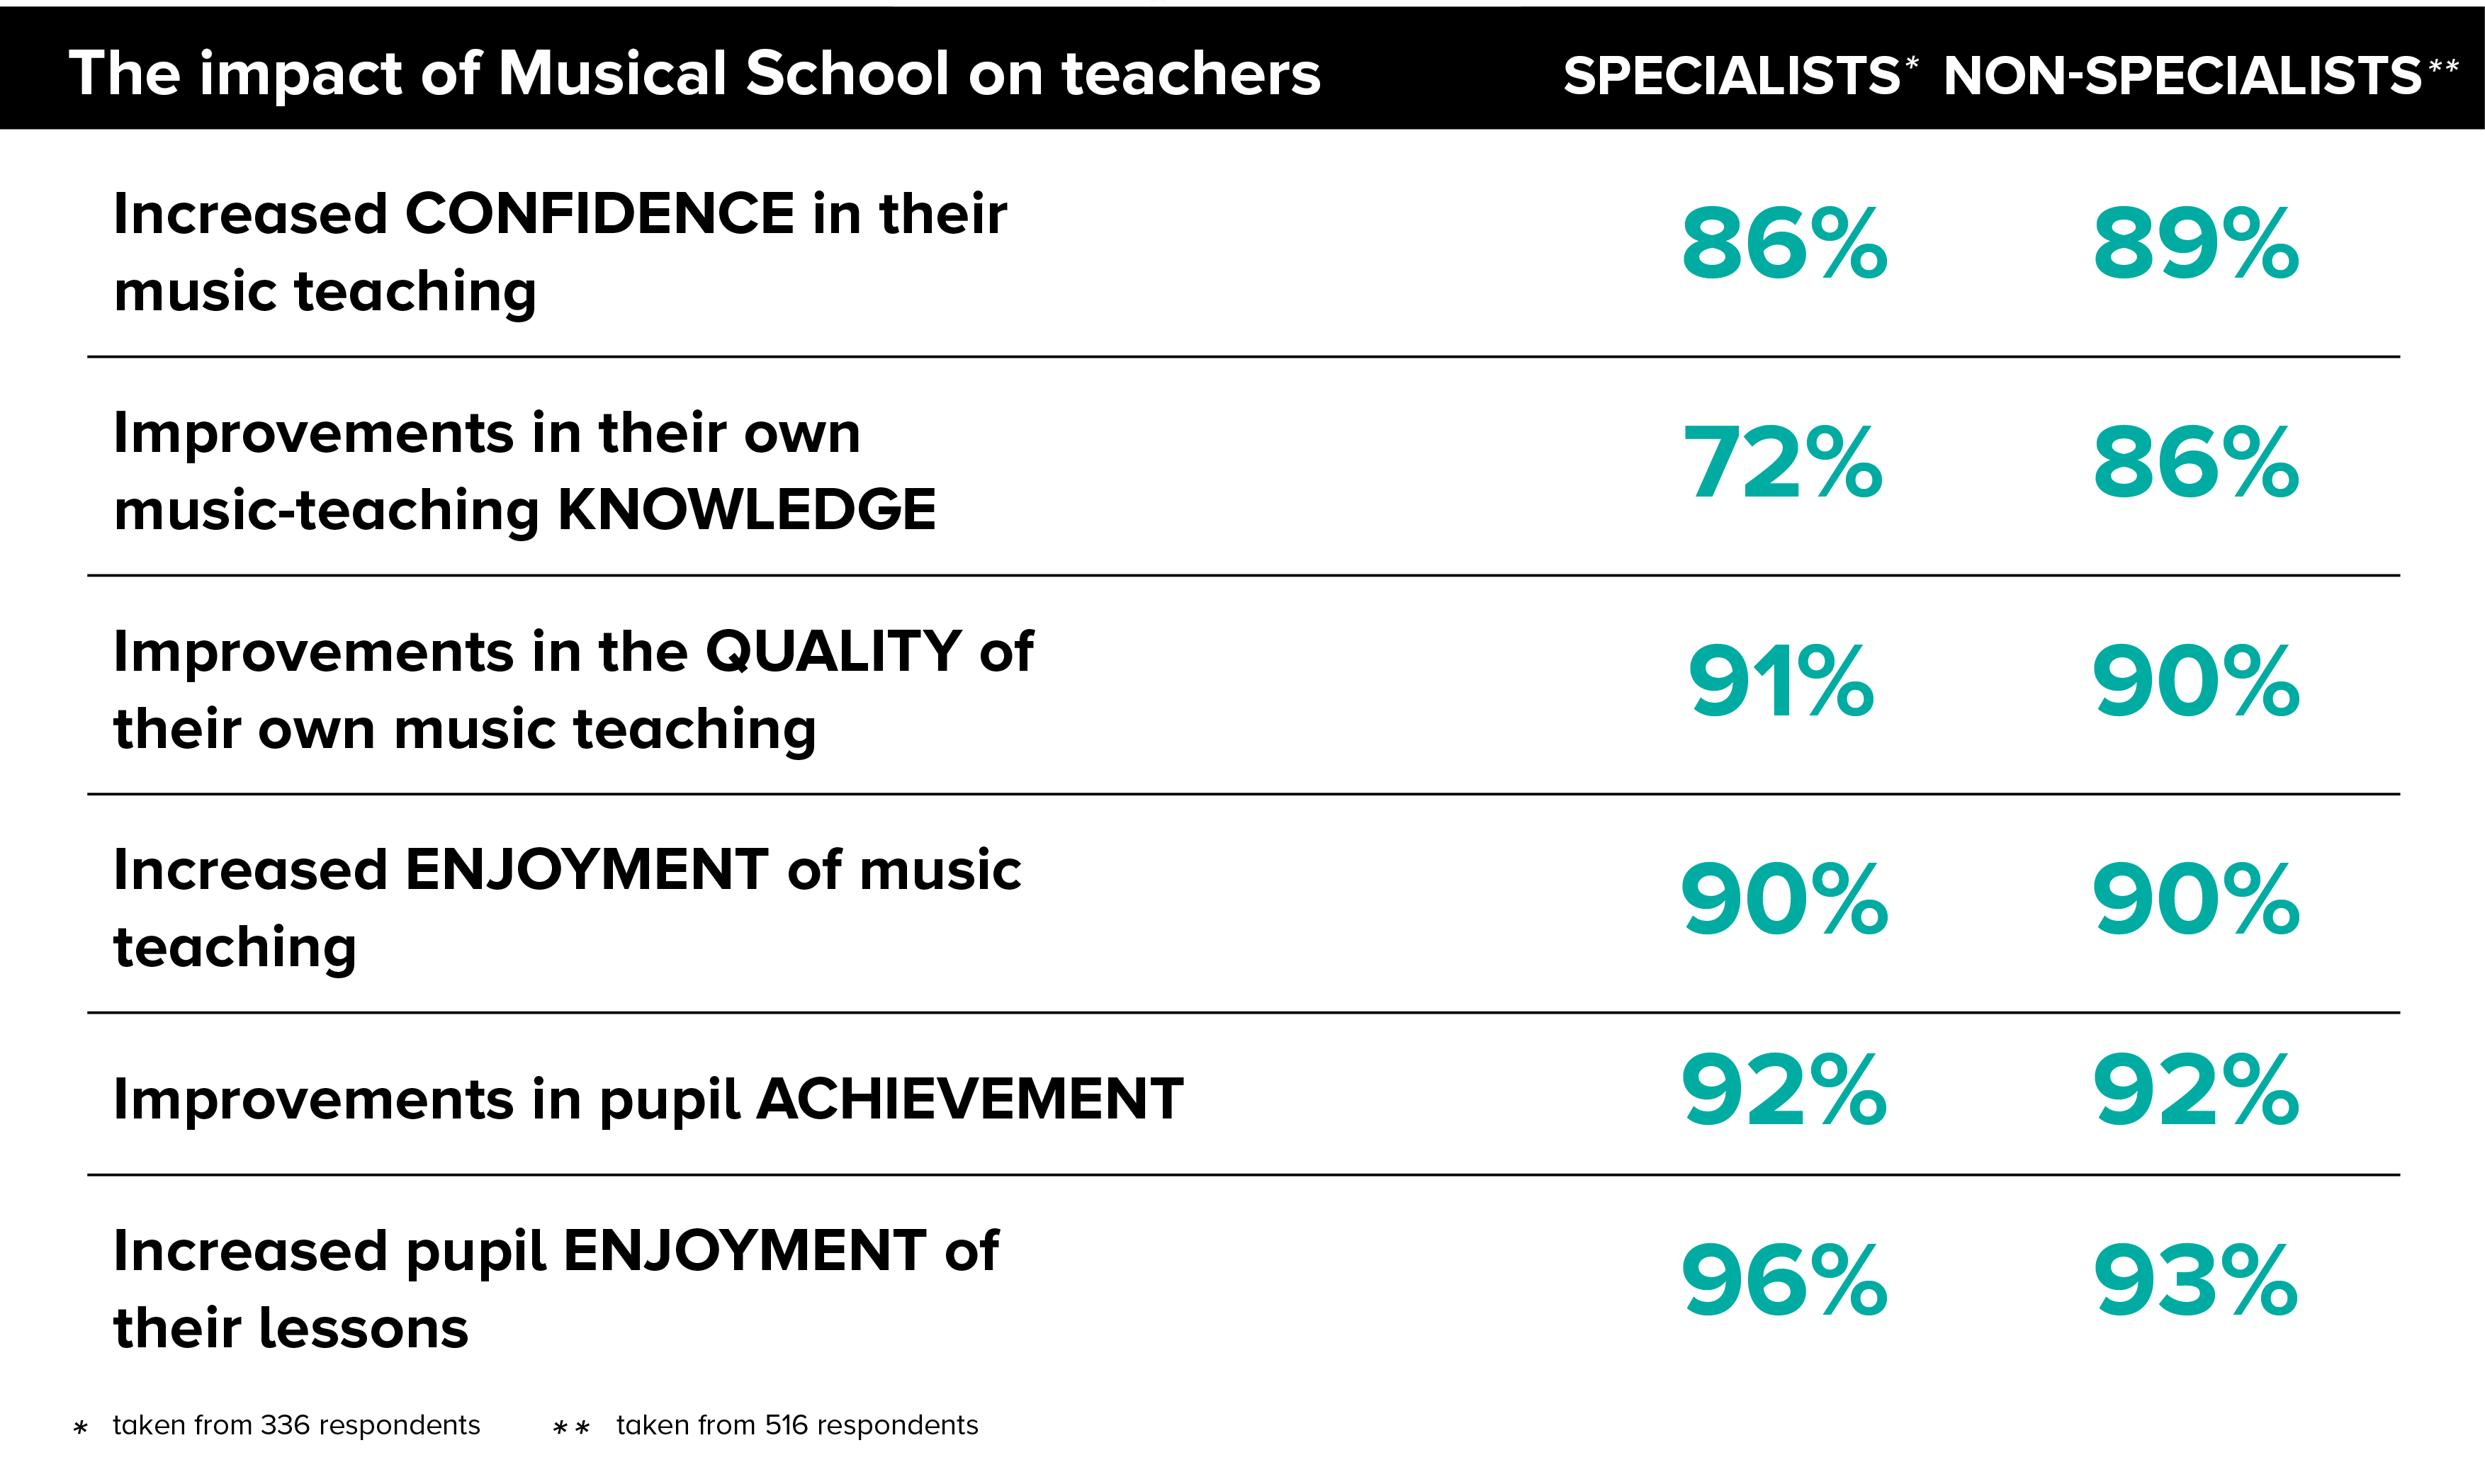 Musical School Impact